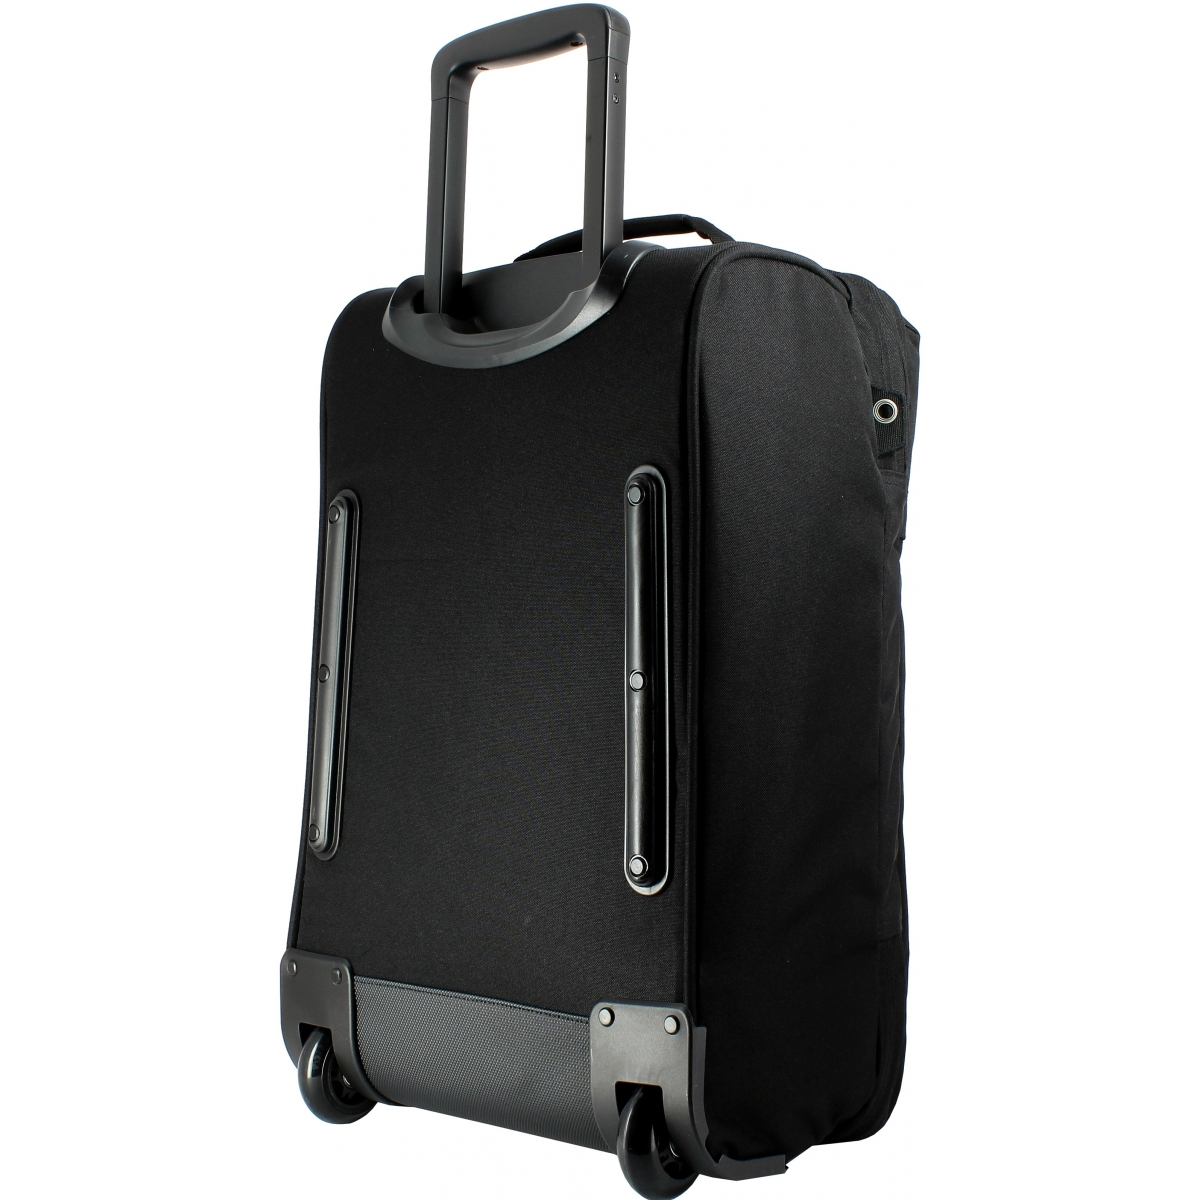 sac de voyage cabine roulettes eastpak ek35f008 couleur principale assortis. Black Bedroom Furniture Sets. Home Design Ideas